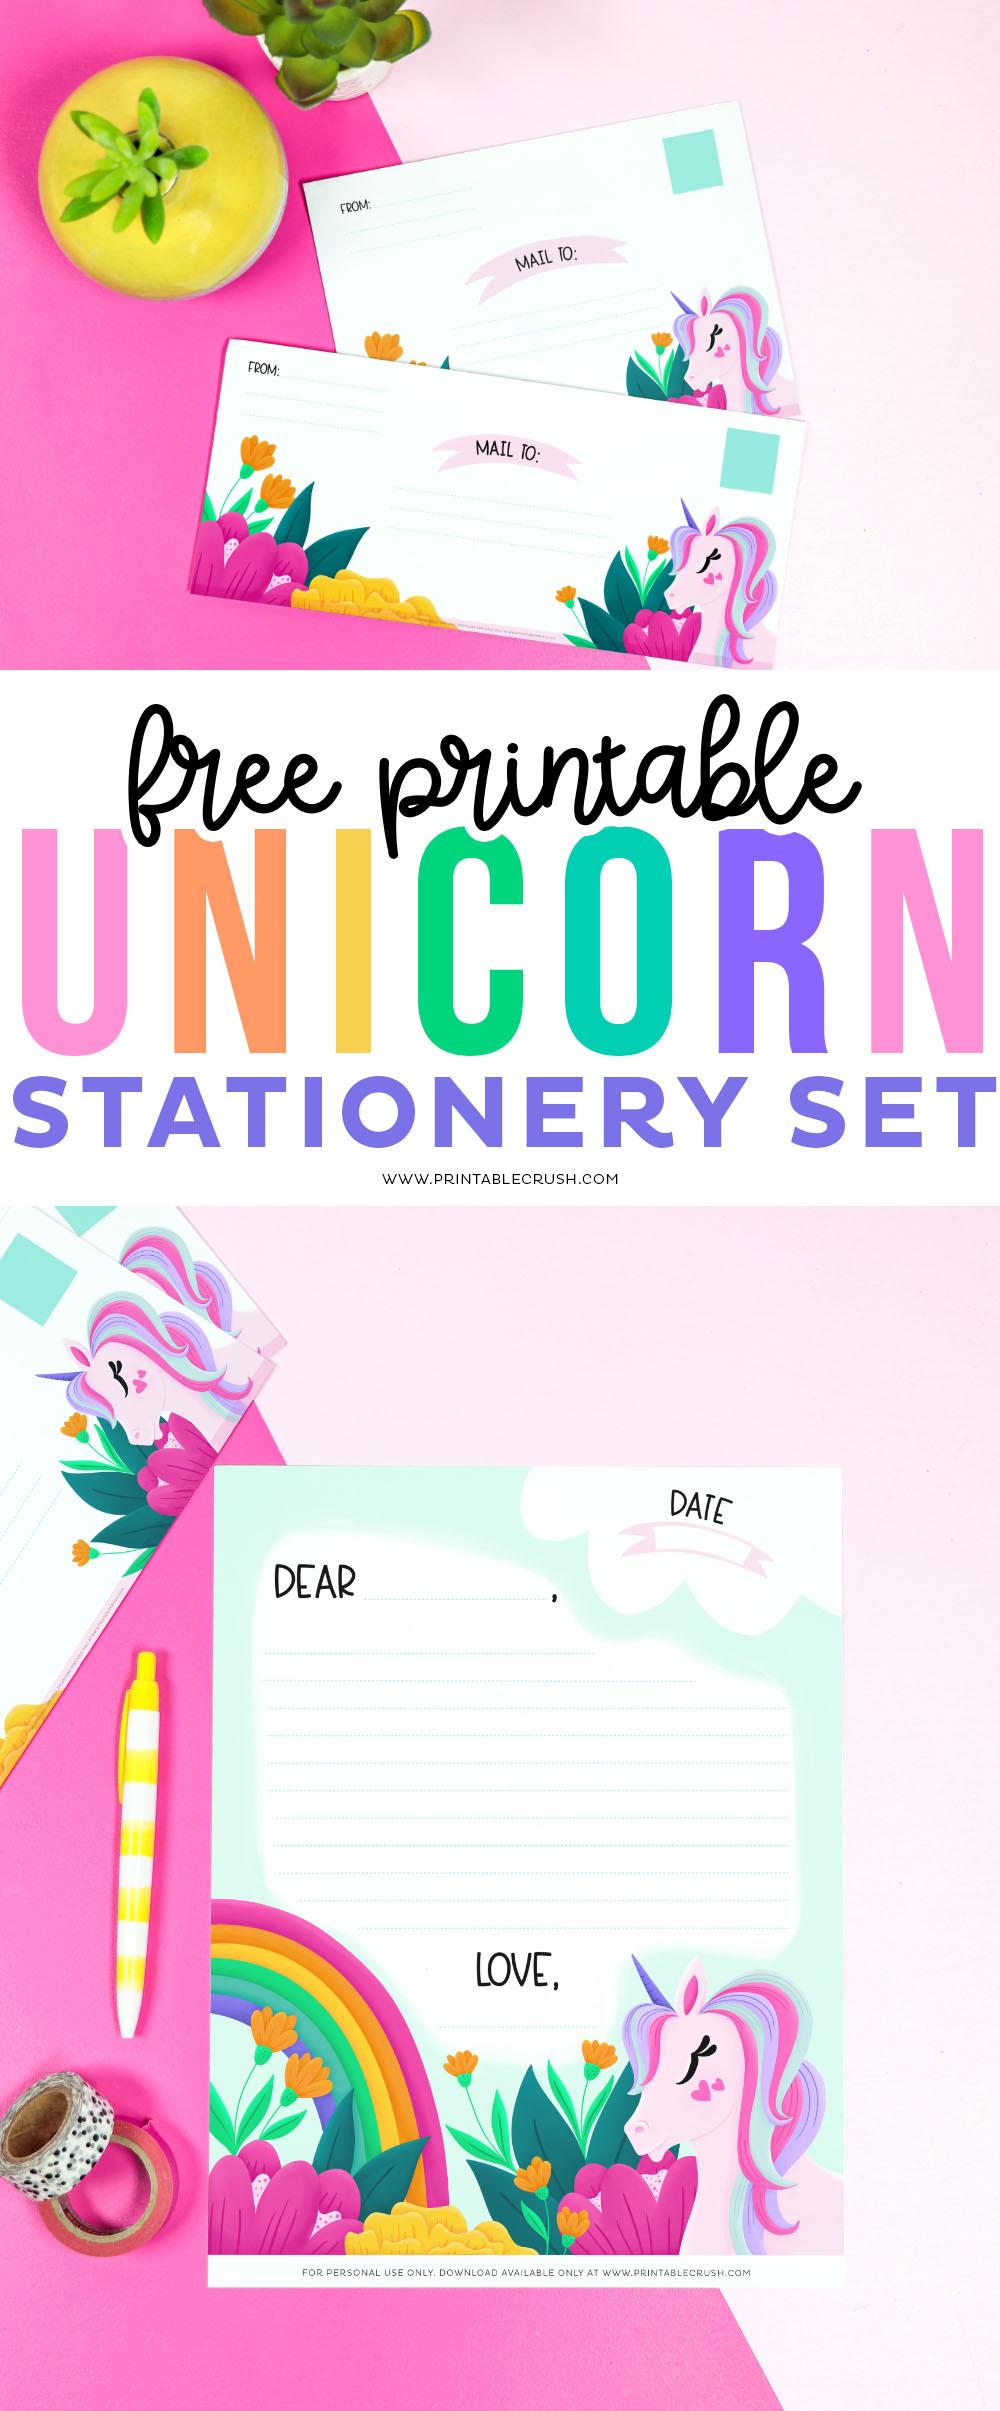 Free Unicorn Stationery Printable Set - Printable Crush